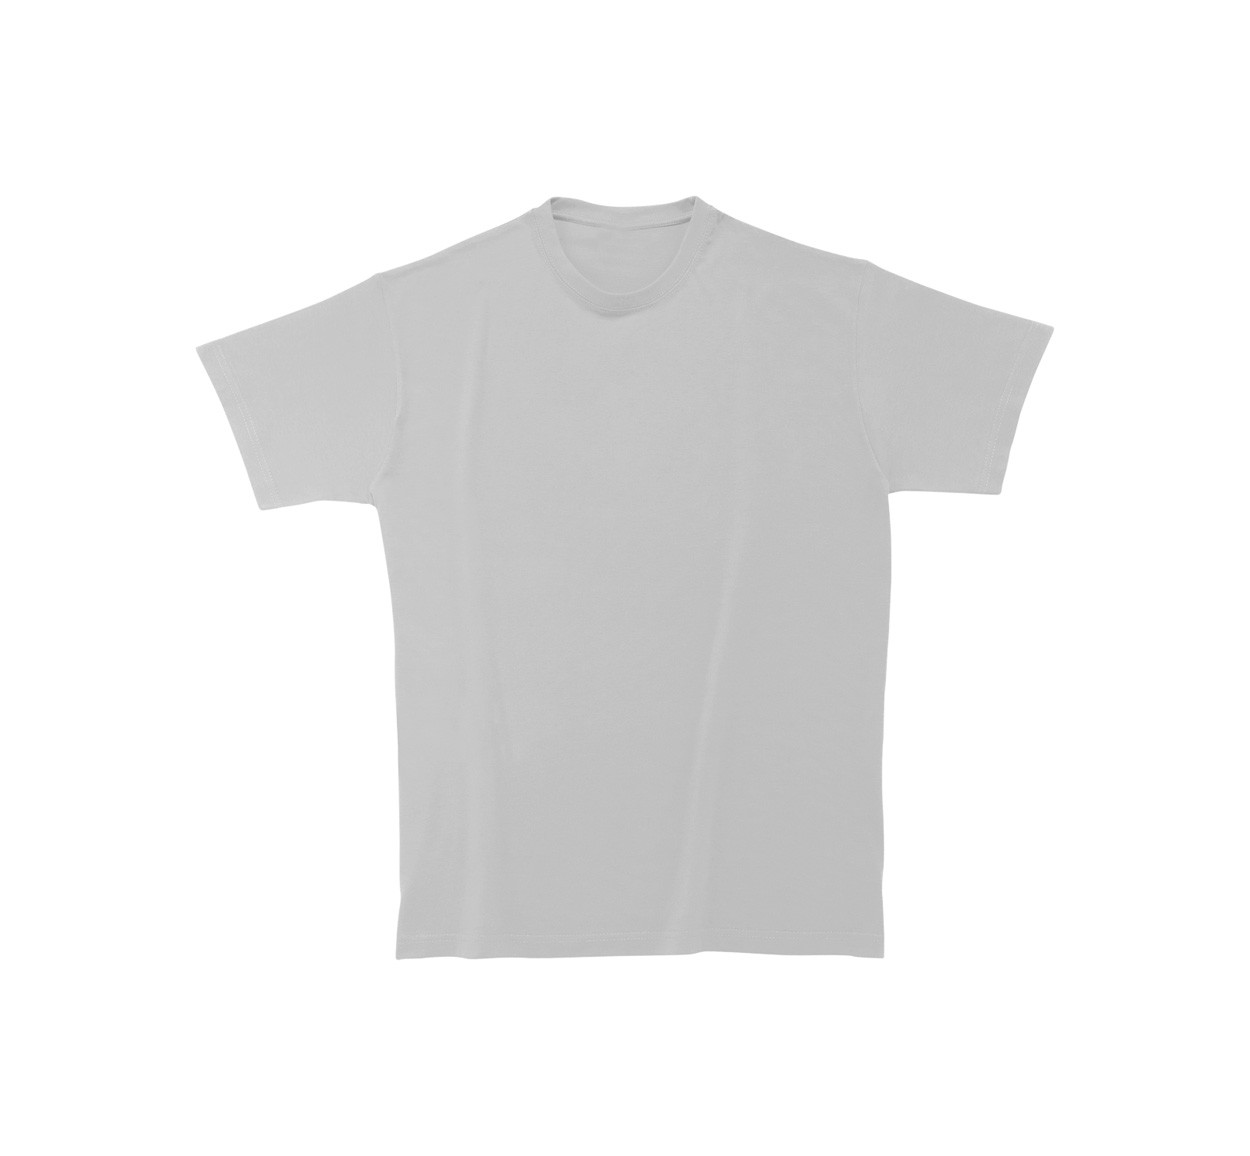 Tričko Heavy Cotton - Bílá / L